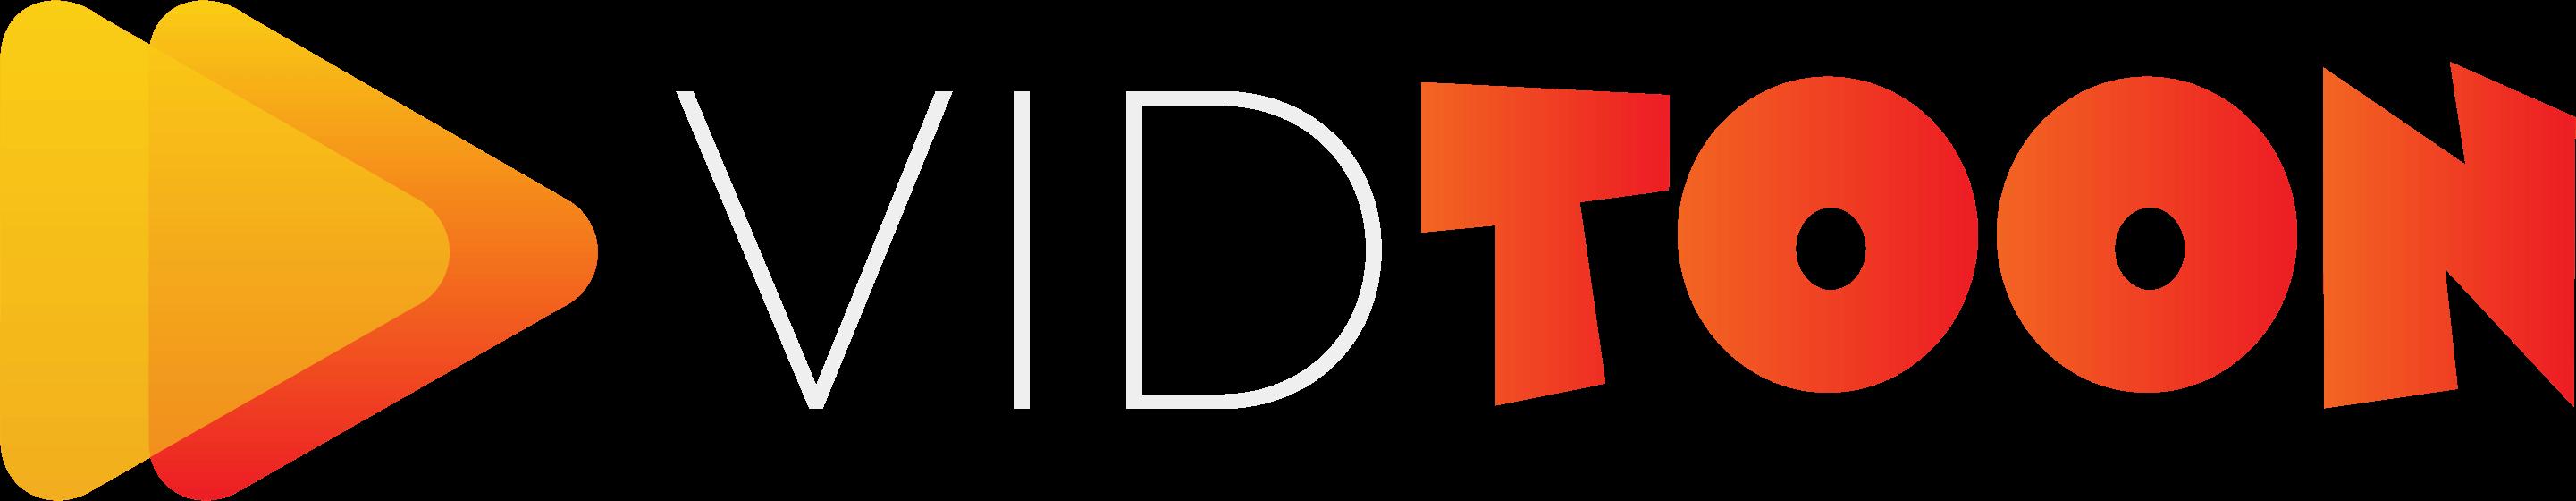 VidToon-Logo